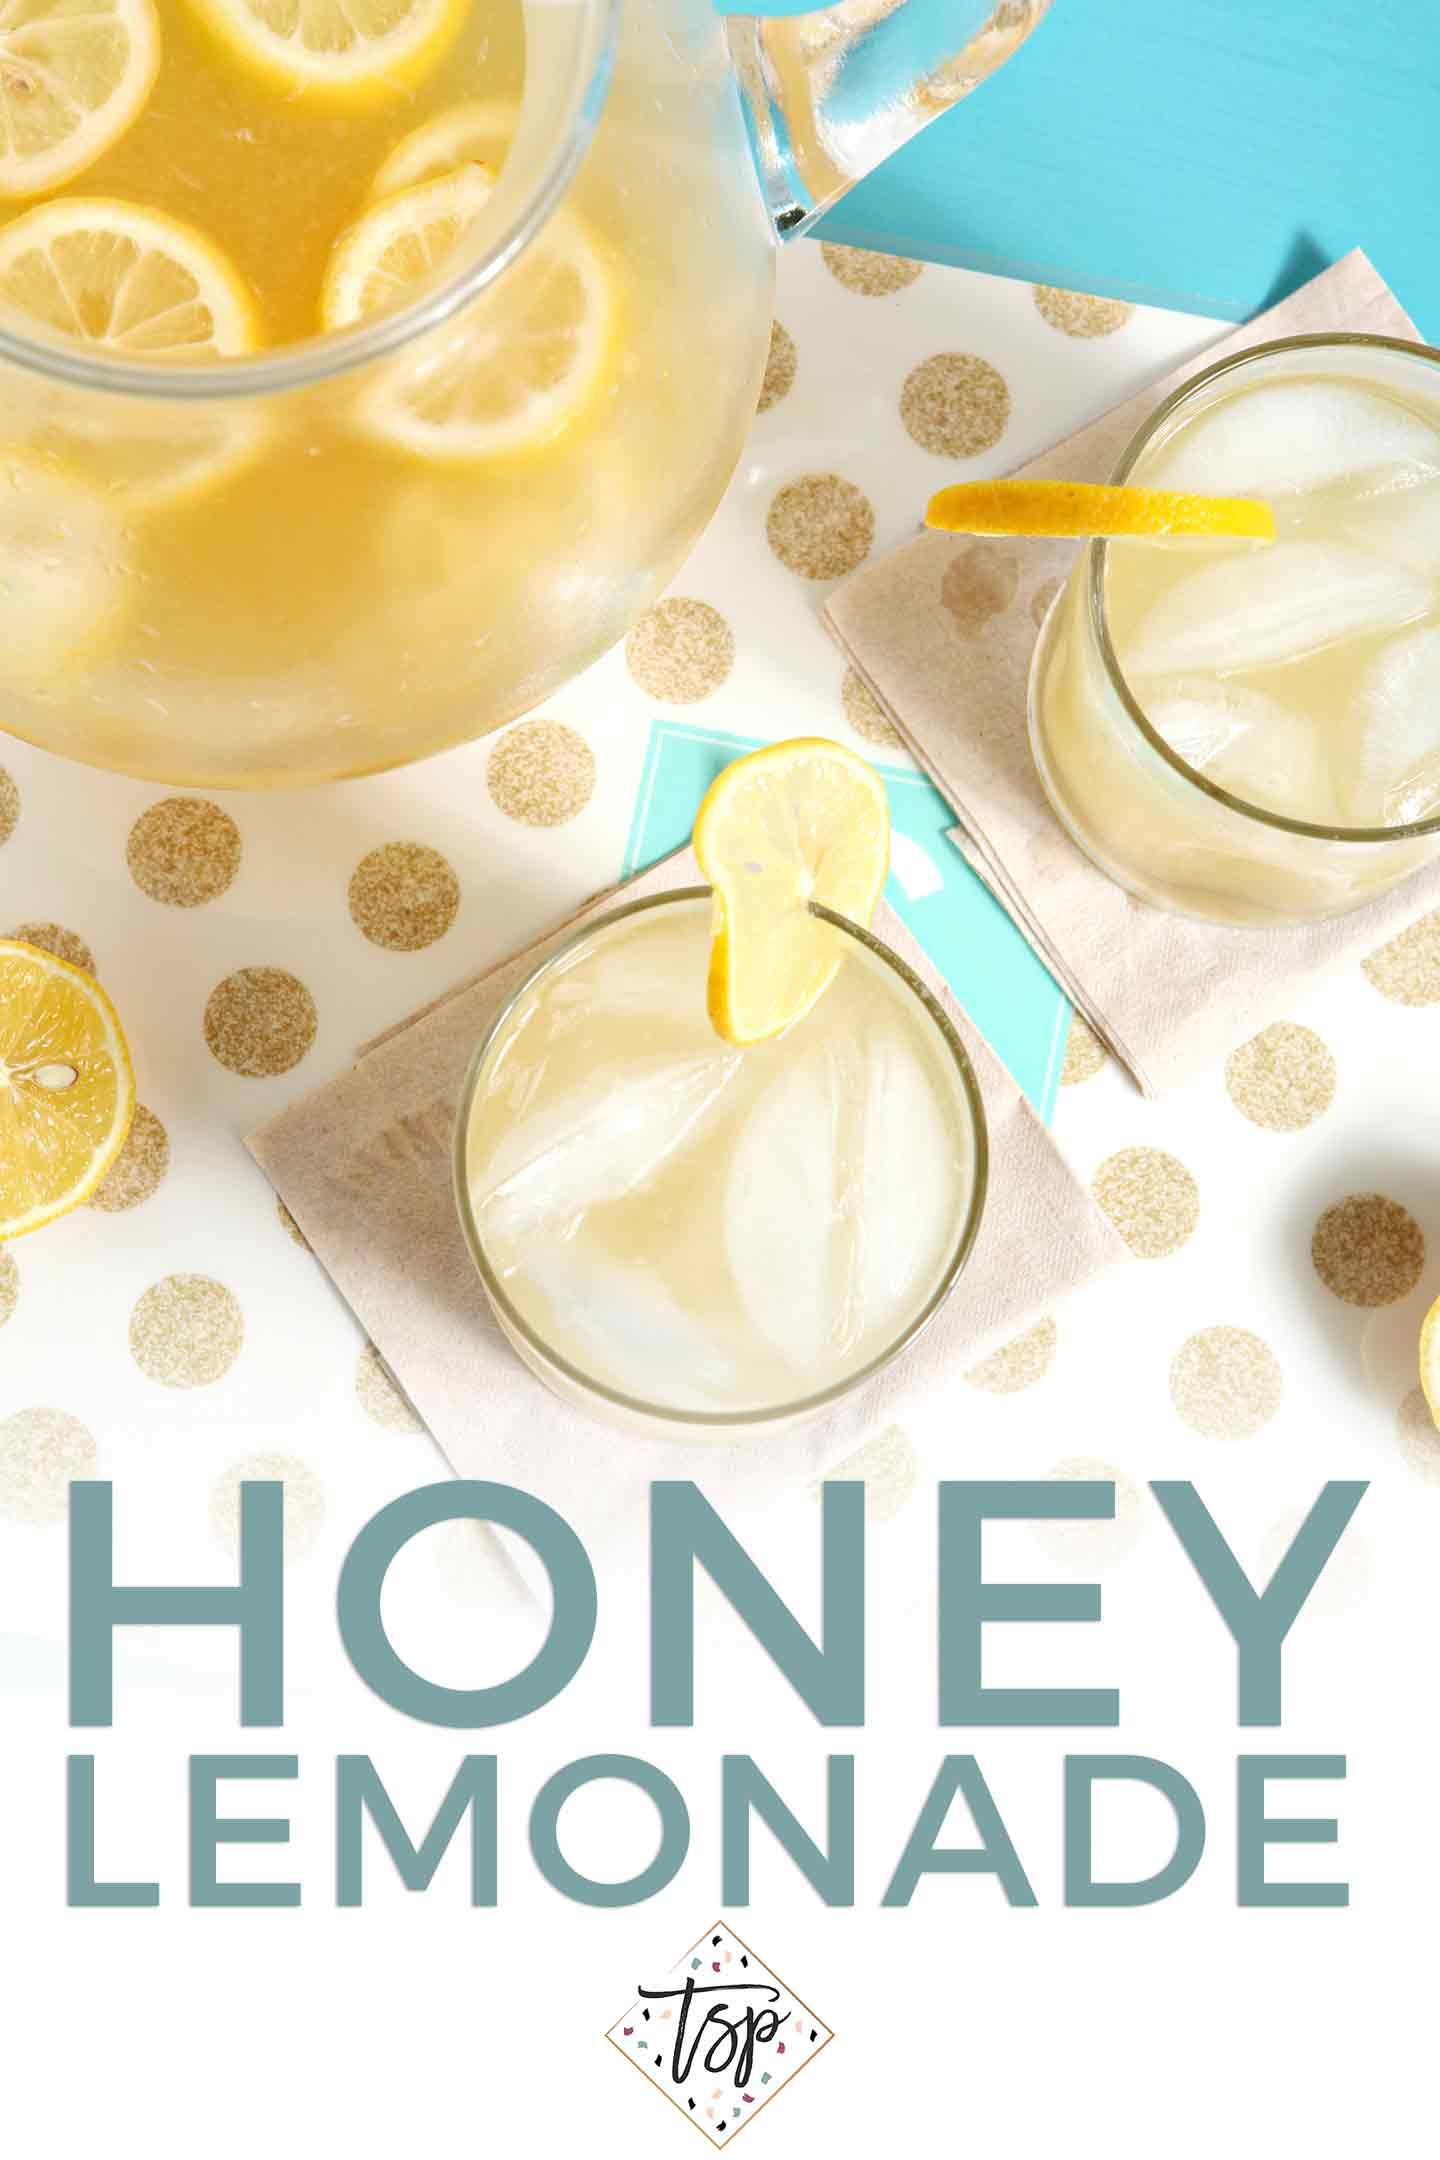 Overhead image of Honey Lemonade with Pinterest text overlaid on it